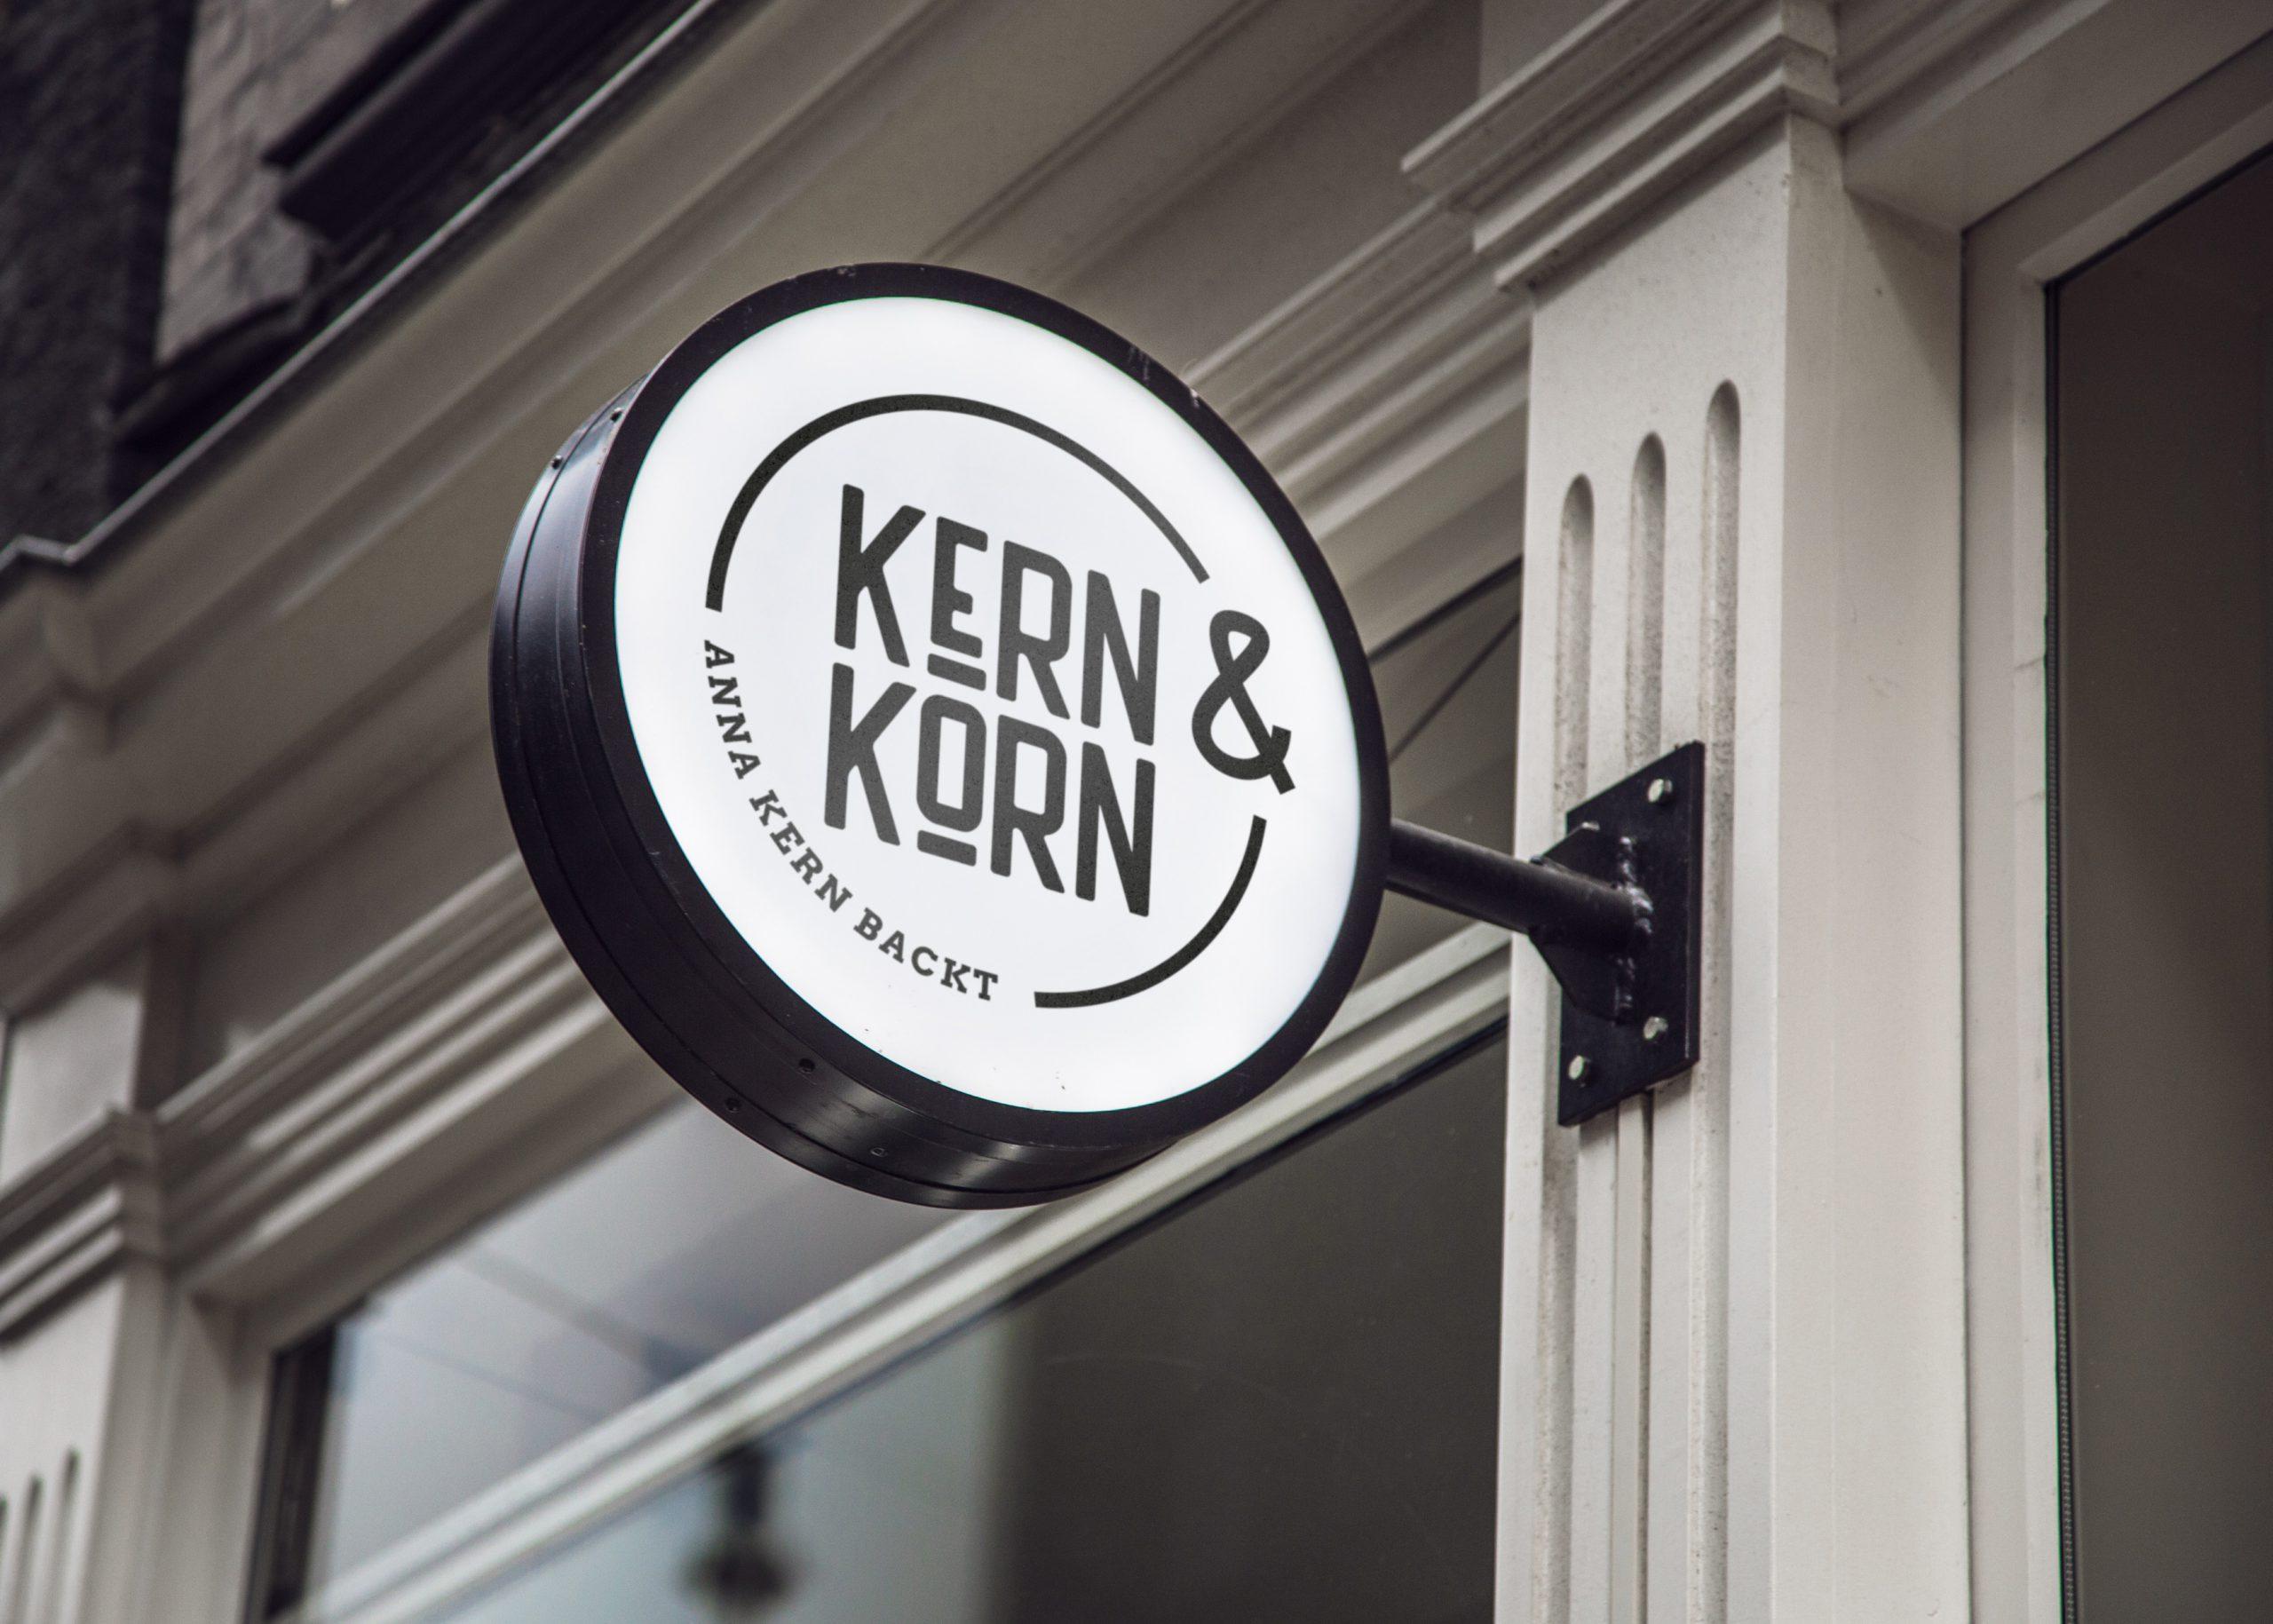 KERN & KORN